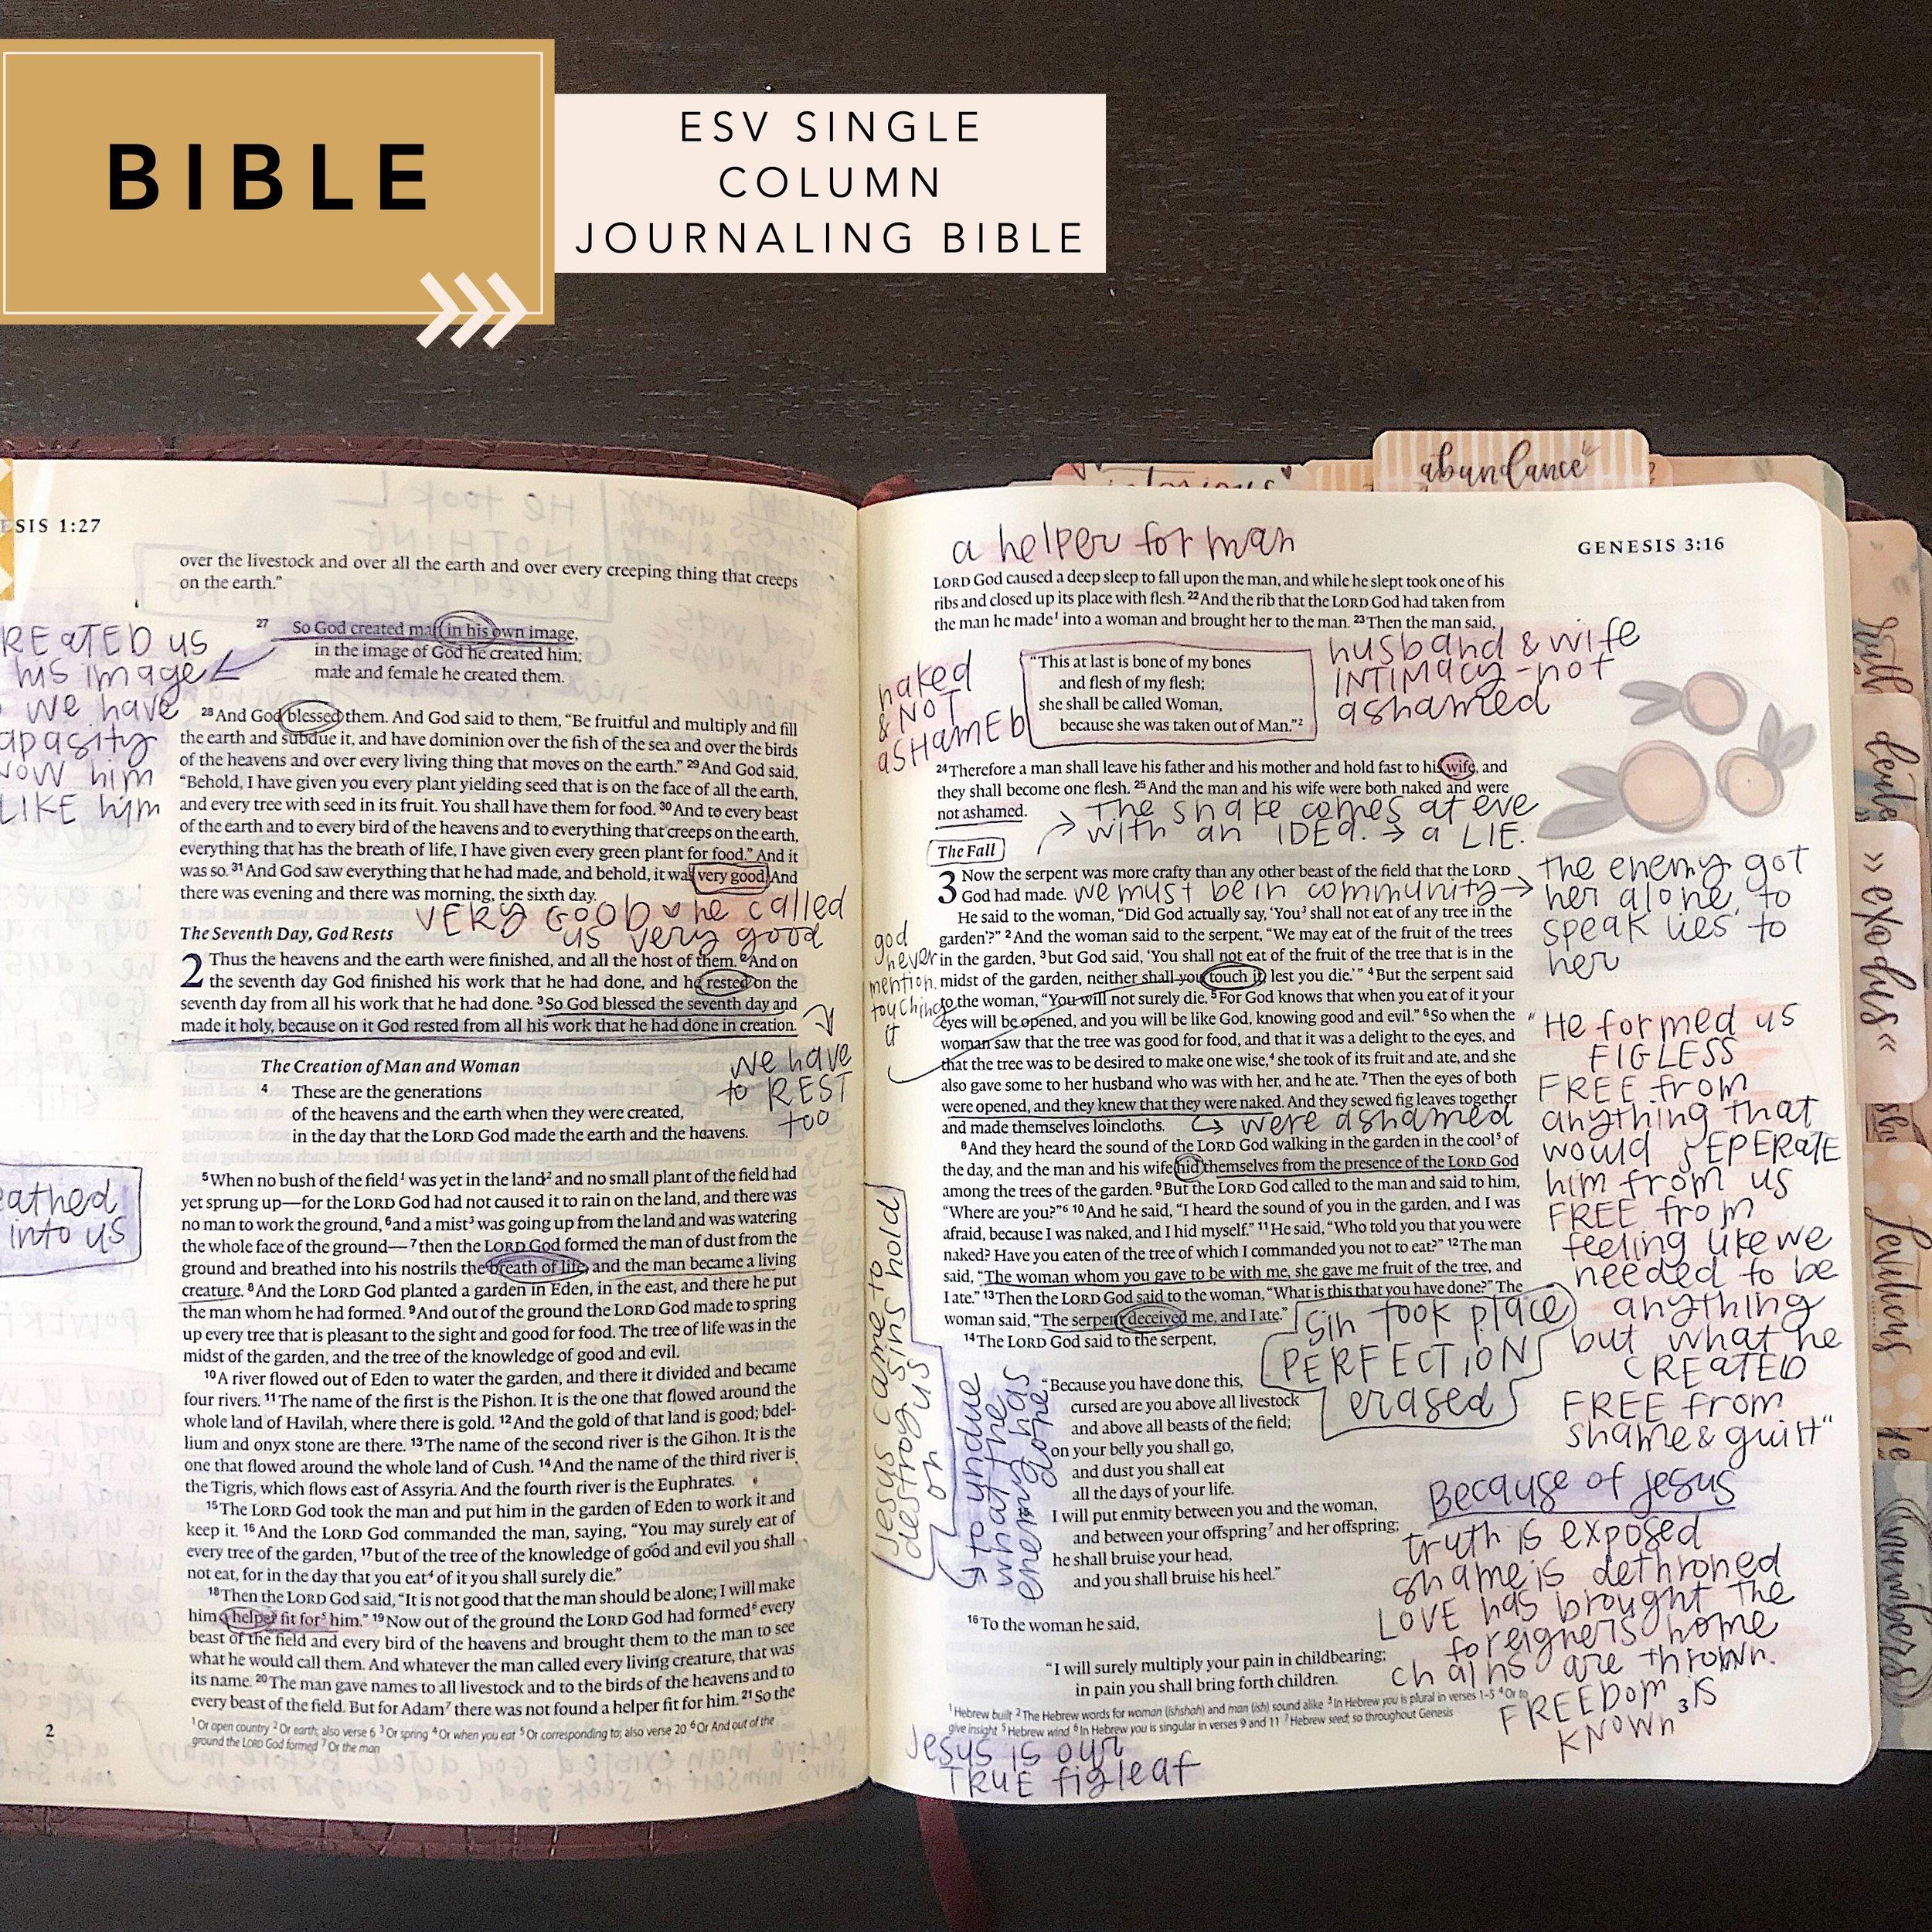 bible comparison: single column journaling bible